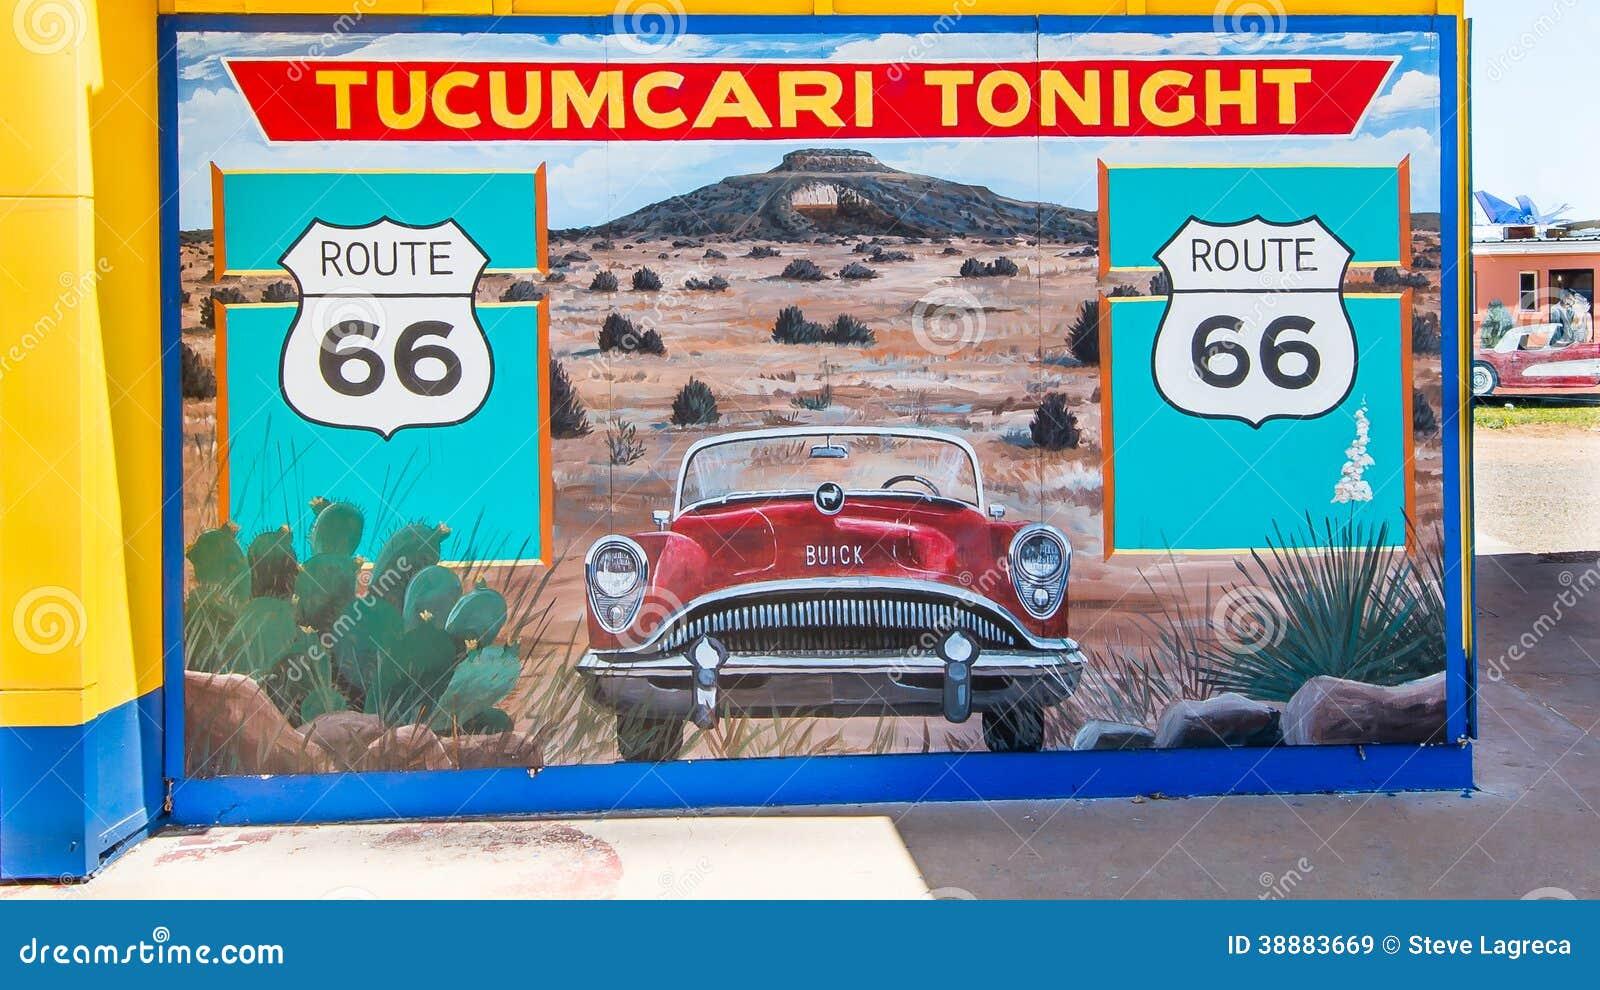 Route 66 tucumcari tonight mural nm editorial stock for Route 66 mural